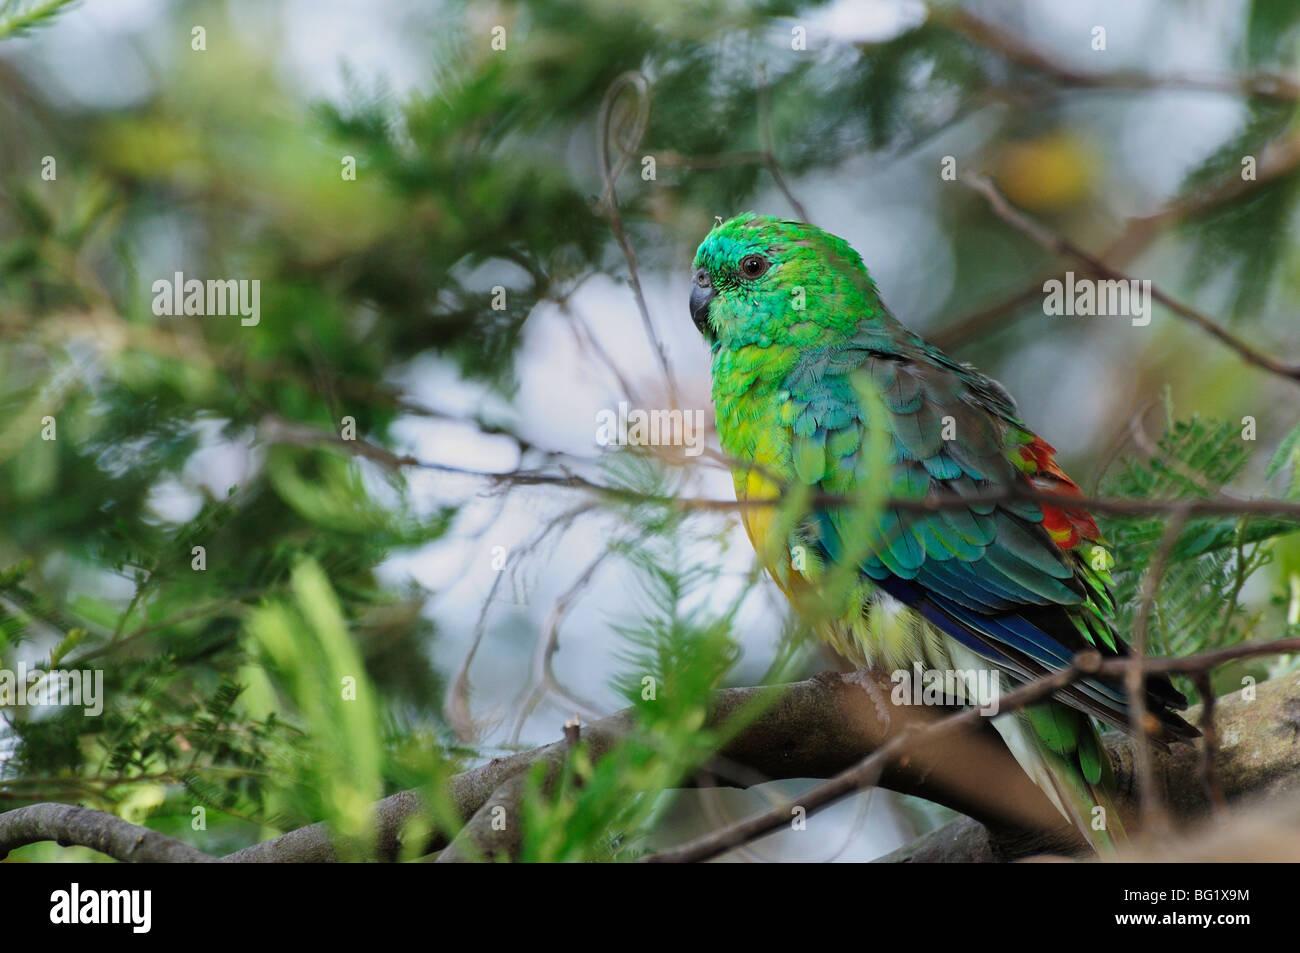 Eastern Rosella, Yarra Bend Park, Melbourne, Victoria, Australia, Pacific - Stock Image